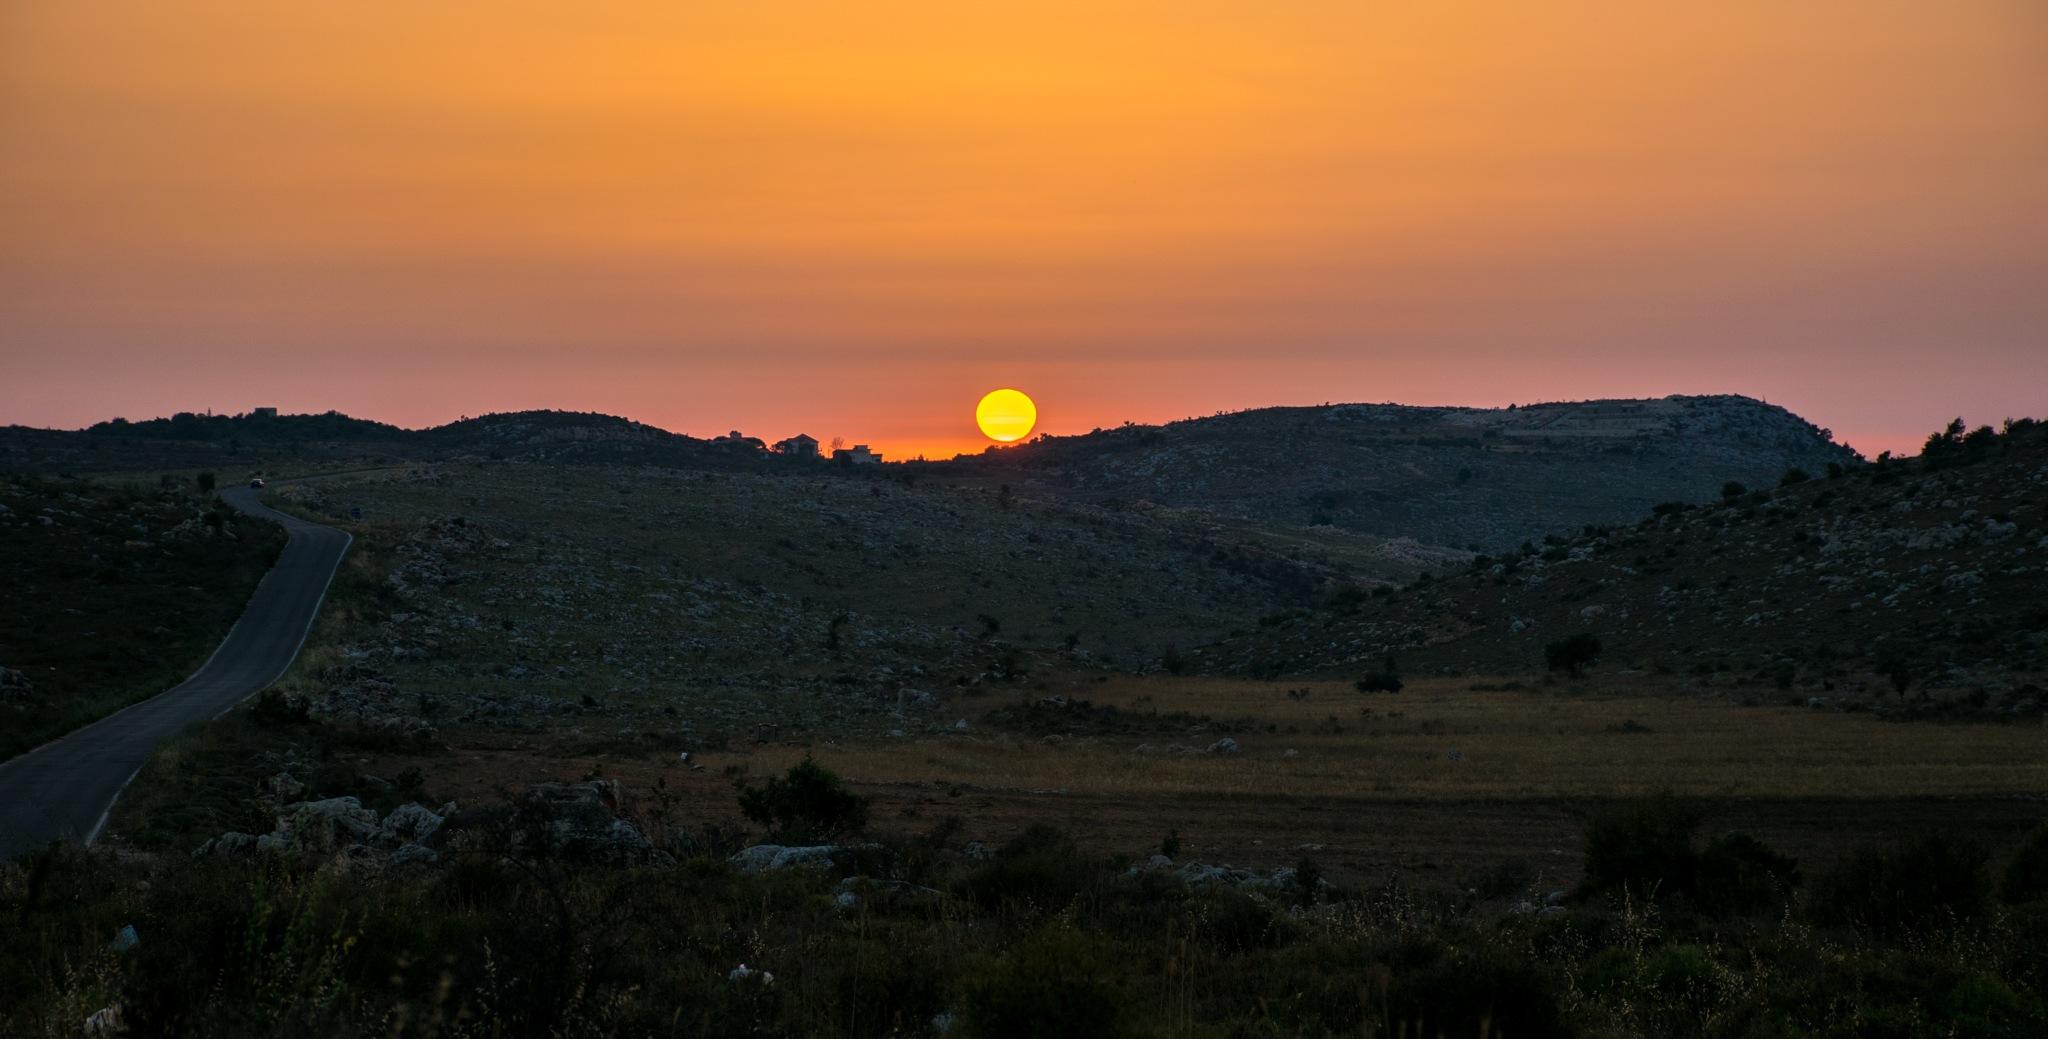 sunset by Mohamad Zinati